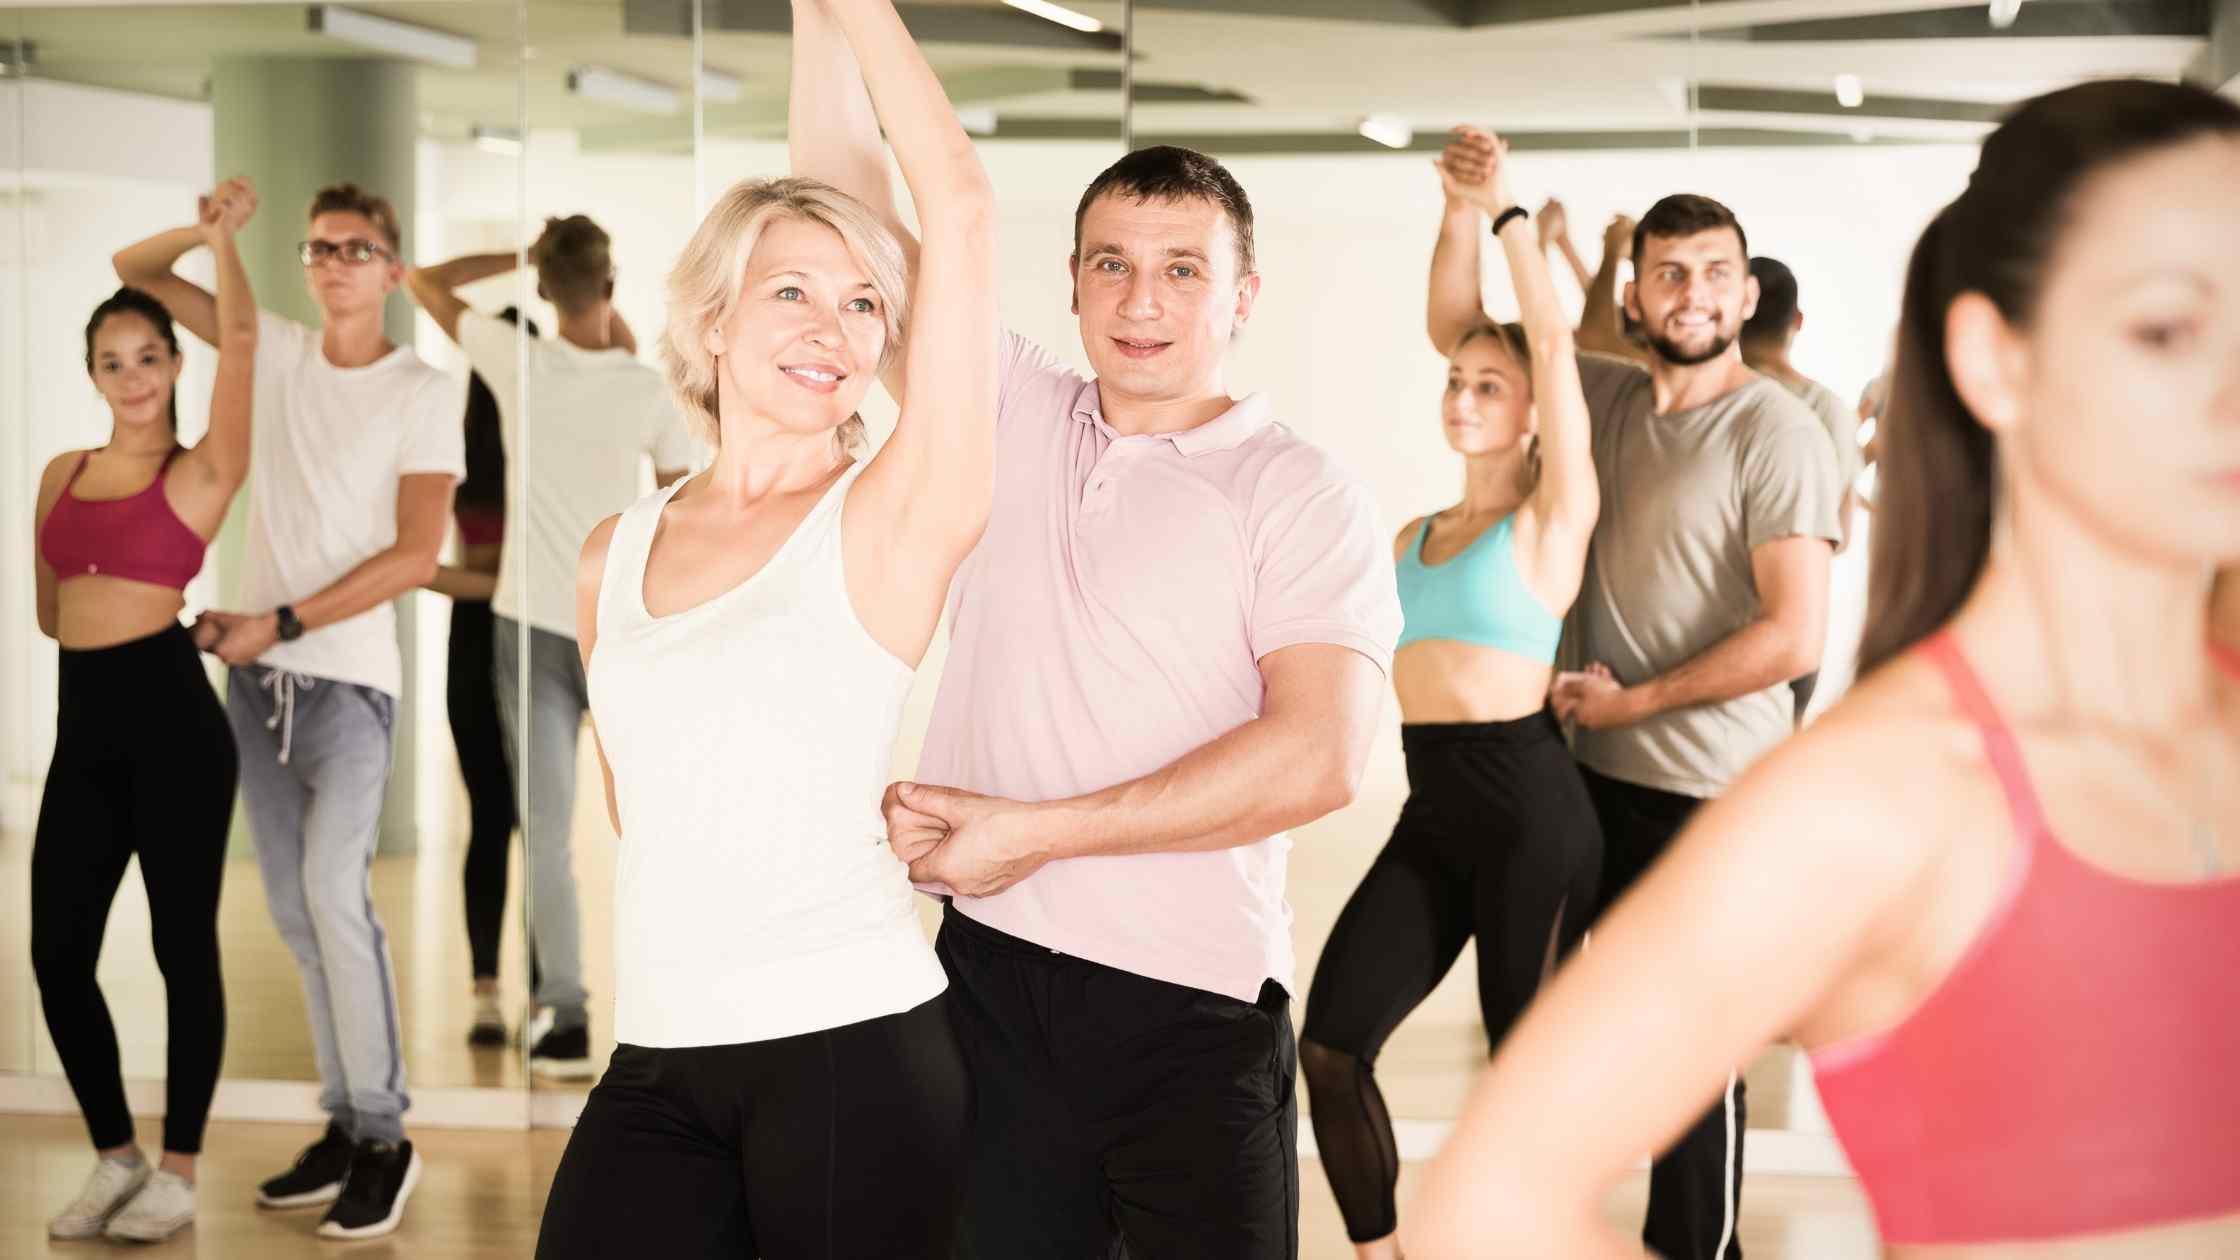 Health benefits of ballroom dance